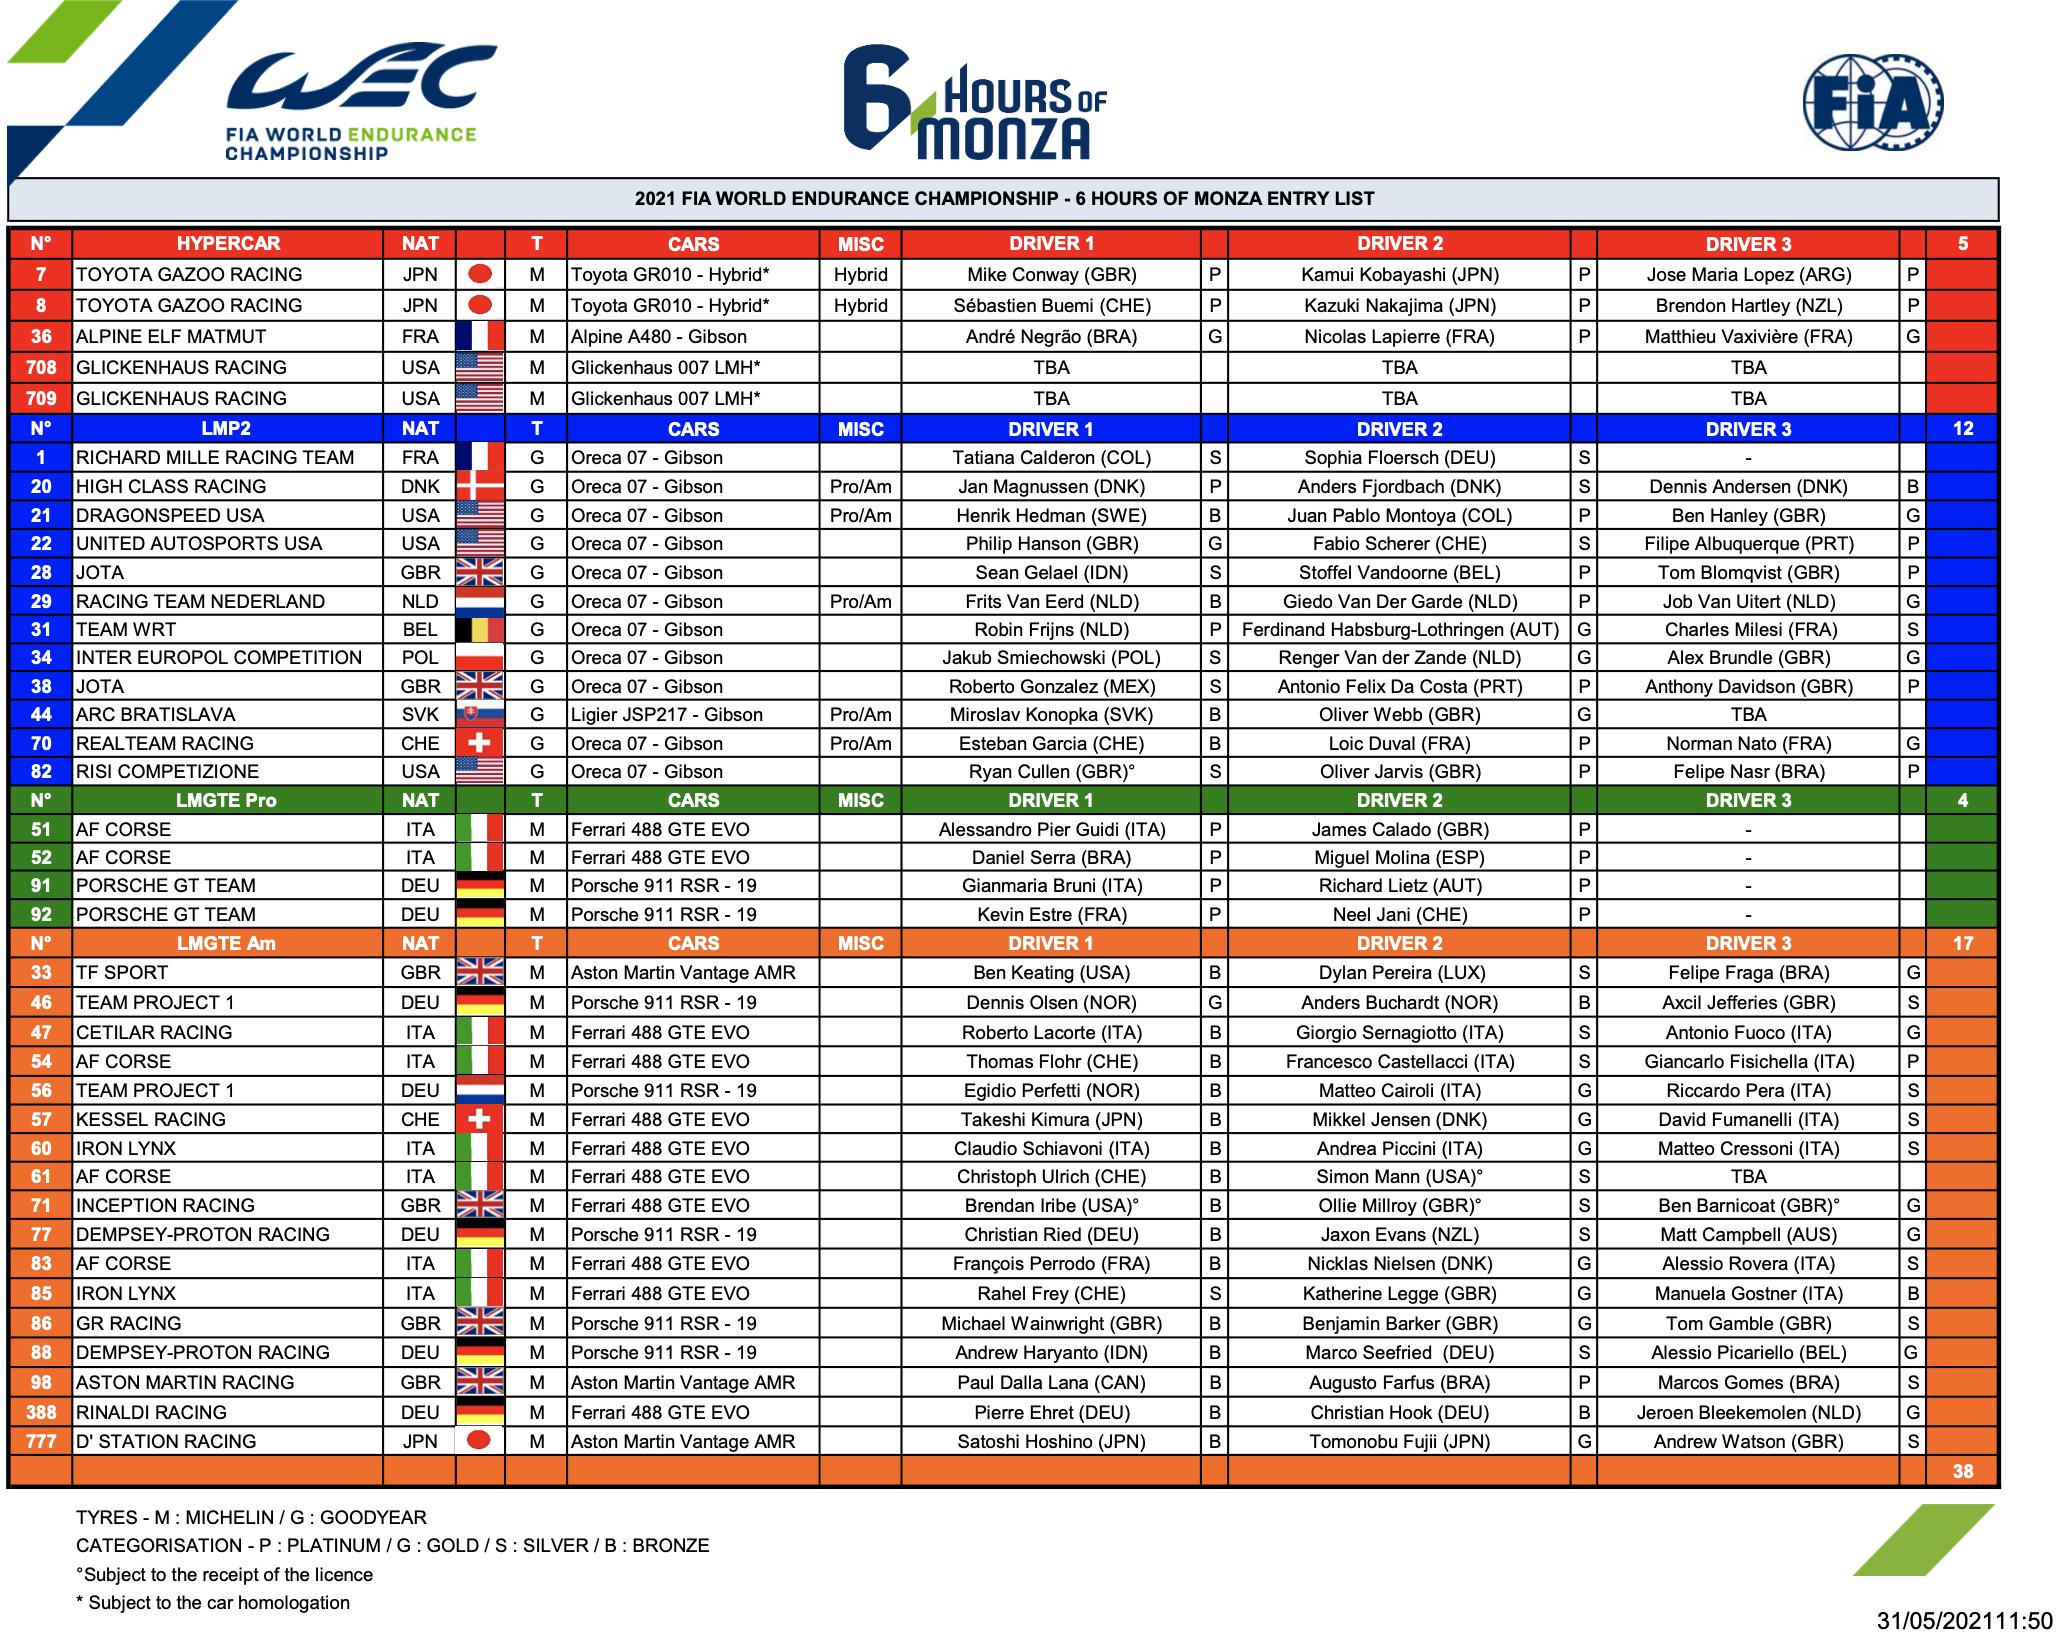 Monza Entry List